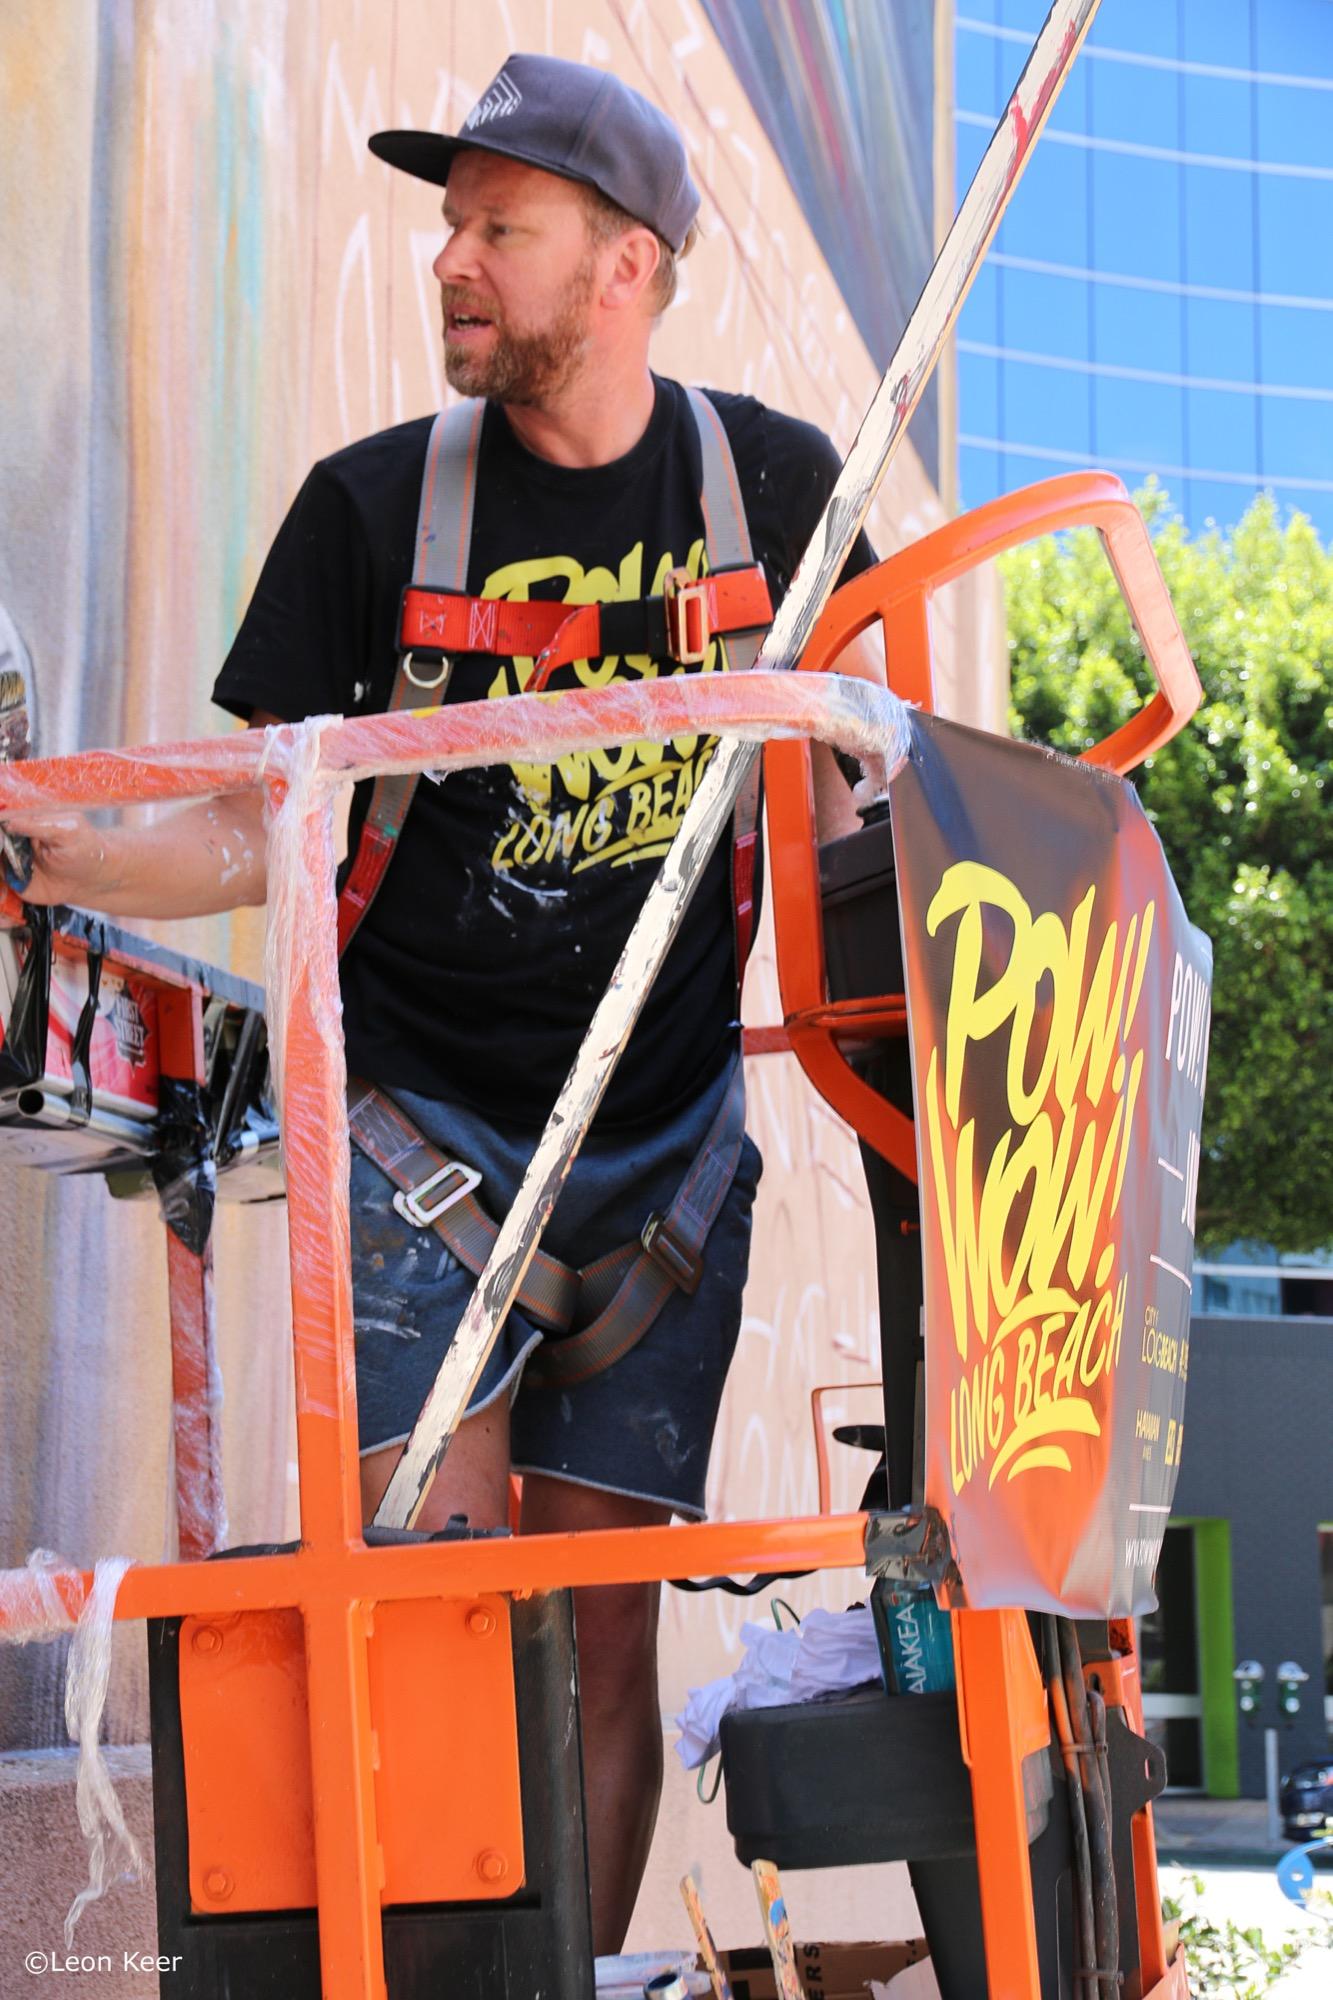 Leon Keer in Long Beach, California Artes & contextos leonkeer powwow longbeach mural 43292014161 o